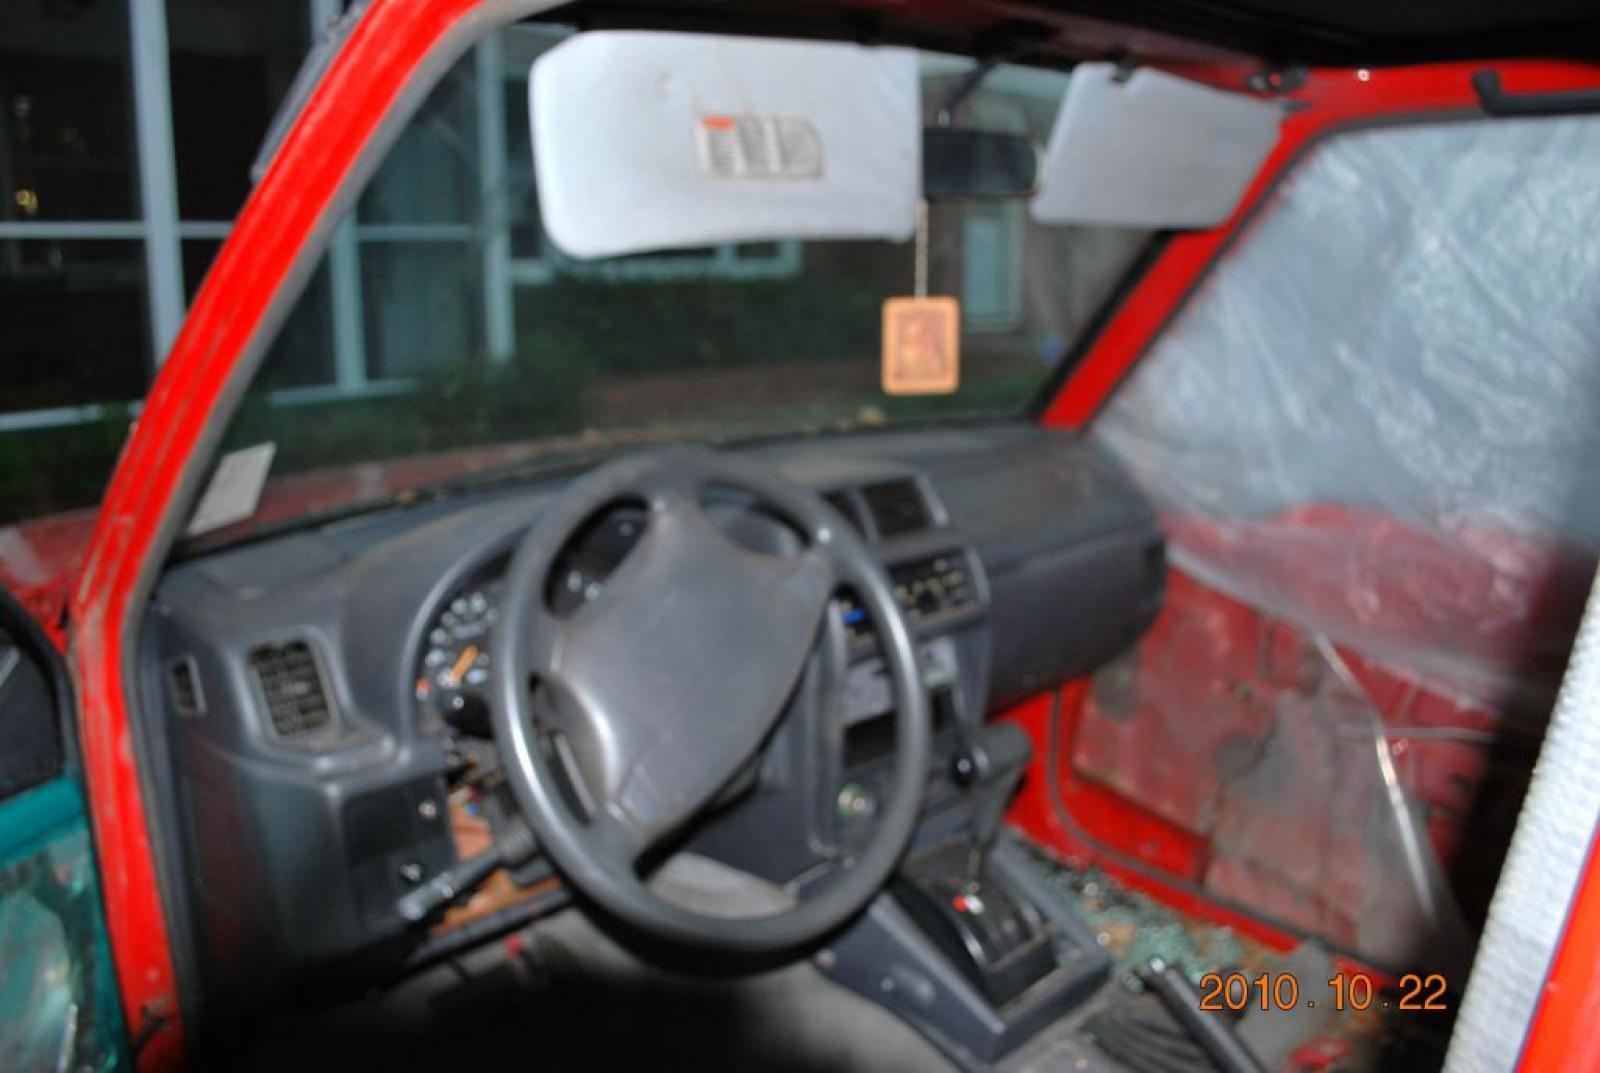 1996 Suzuki Sidekick Information And Photos Zombiedrive Esteem Under Dash Fuse Box Diagram 800 1024 1280 1600 Origin